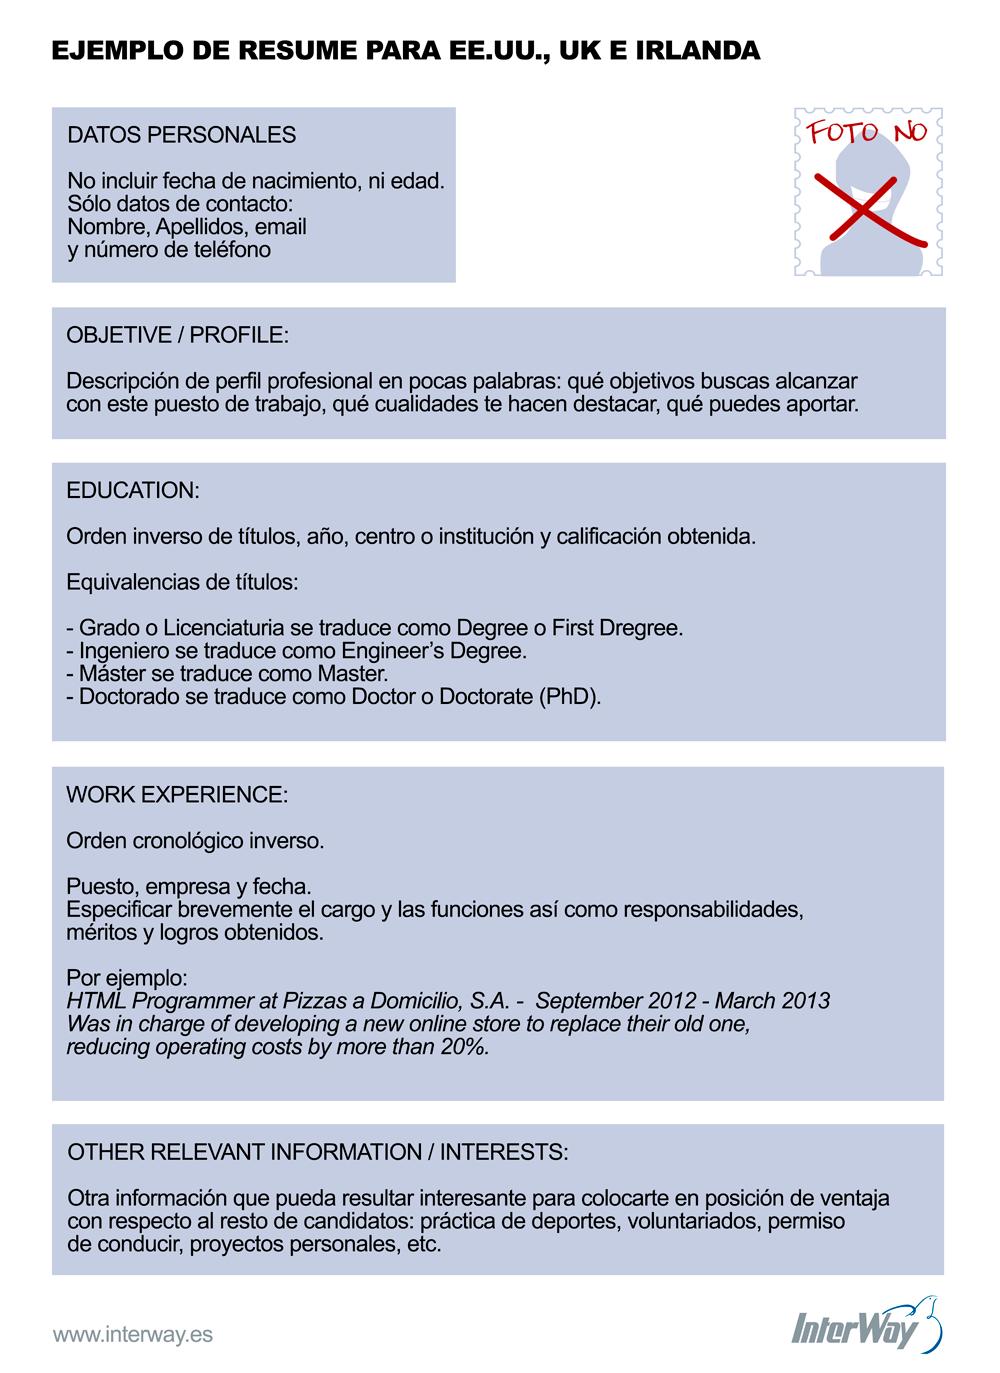 Curriculum en inglés para trabajar en USA - UK - Irlanda #infografia ...